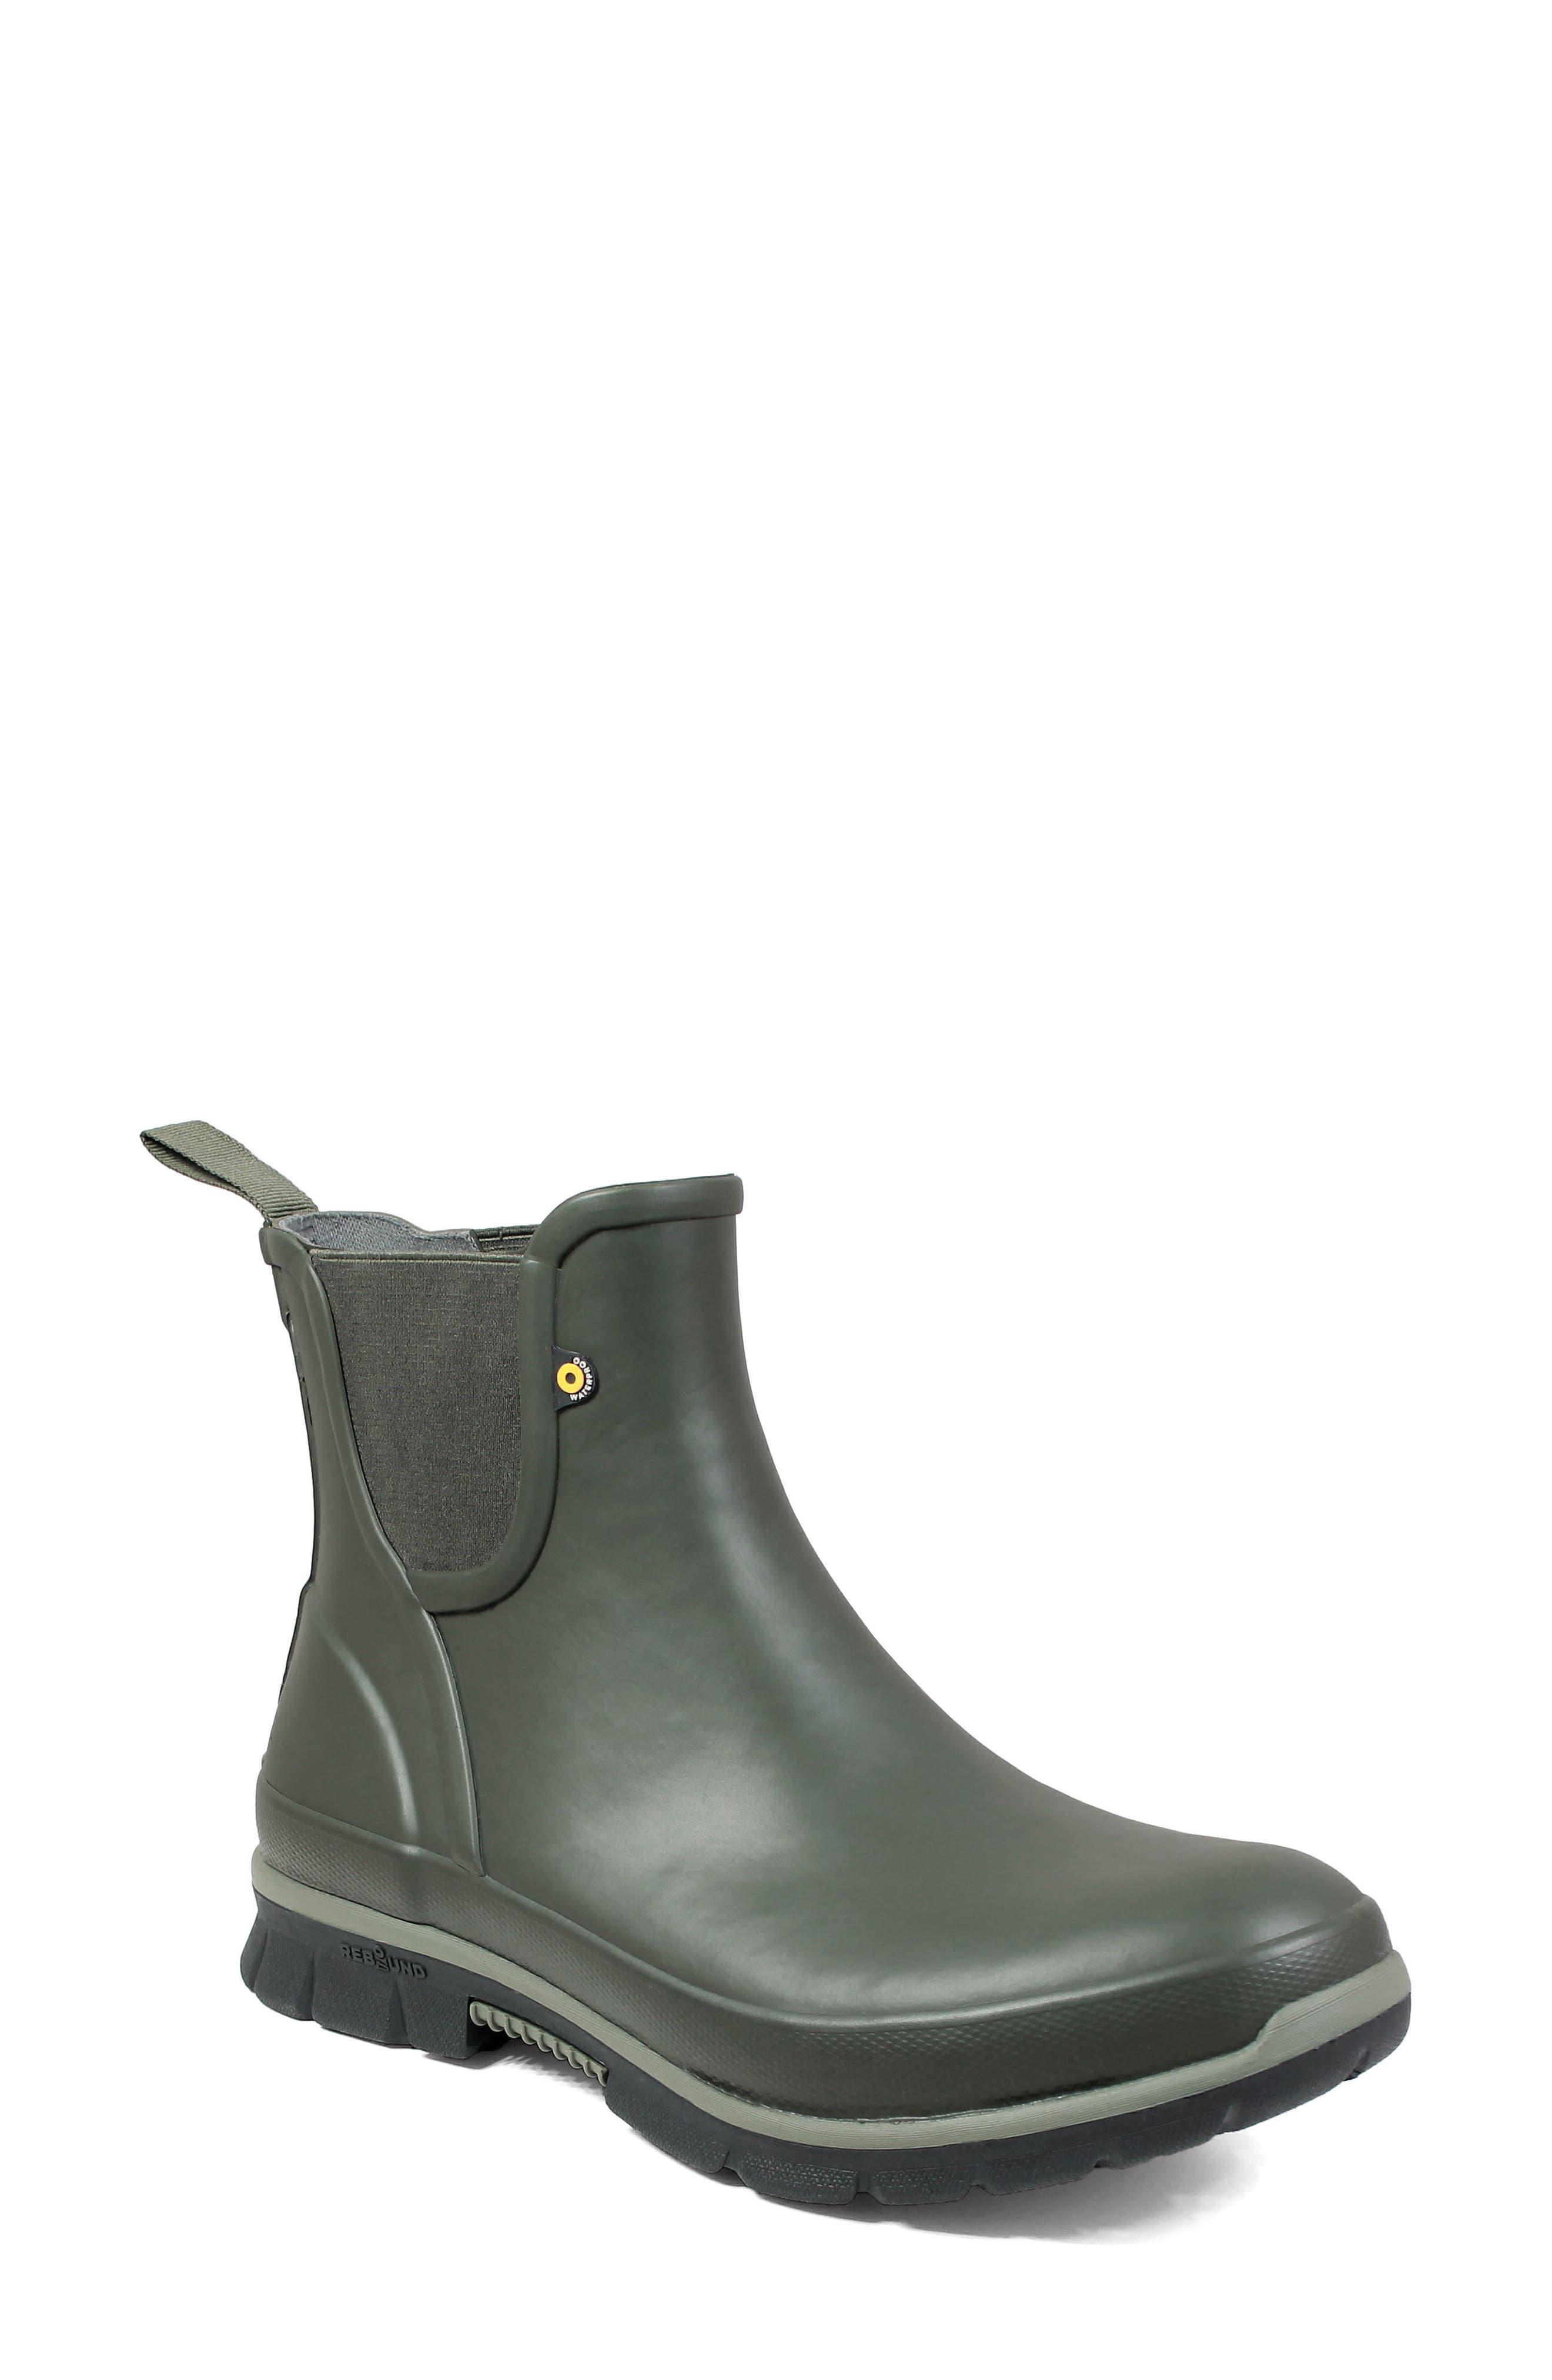 Bogs Amanda Waterproof Rain Boot, Green